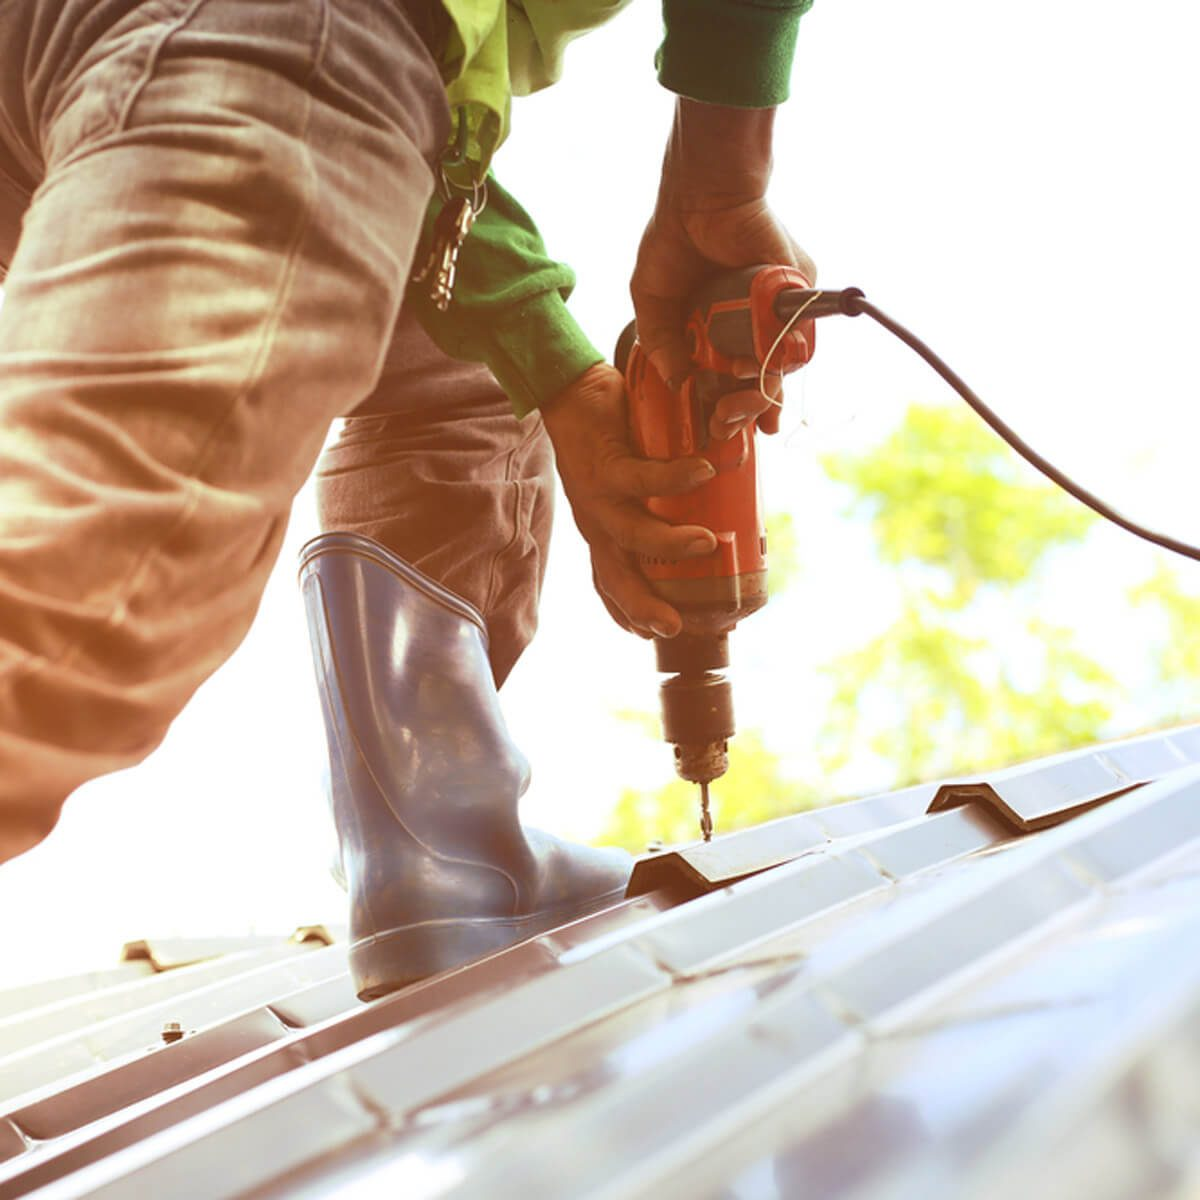 Man Installing Roof